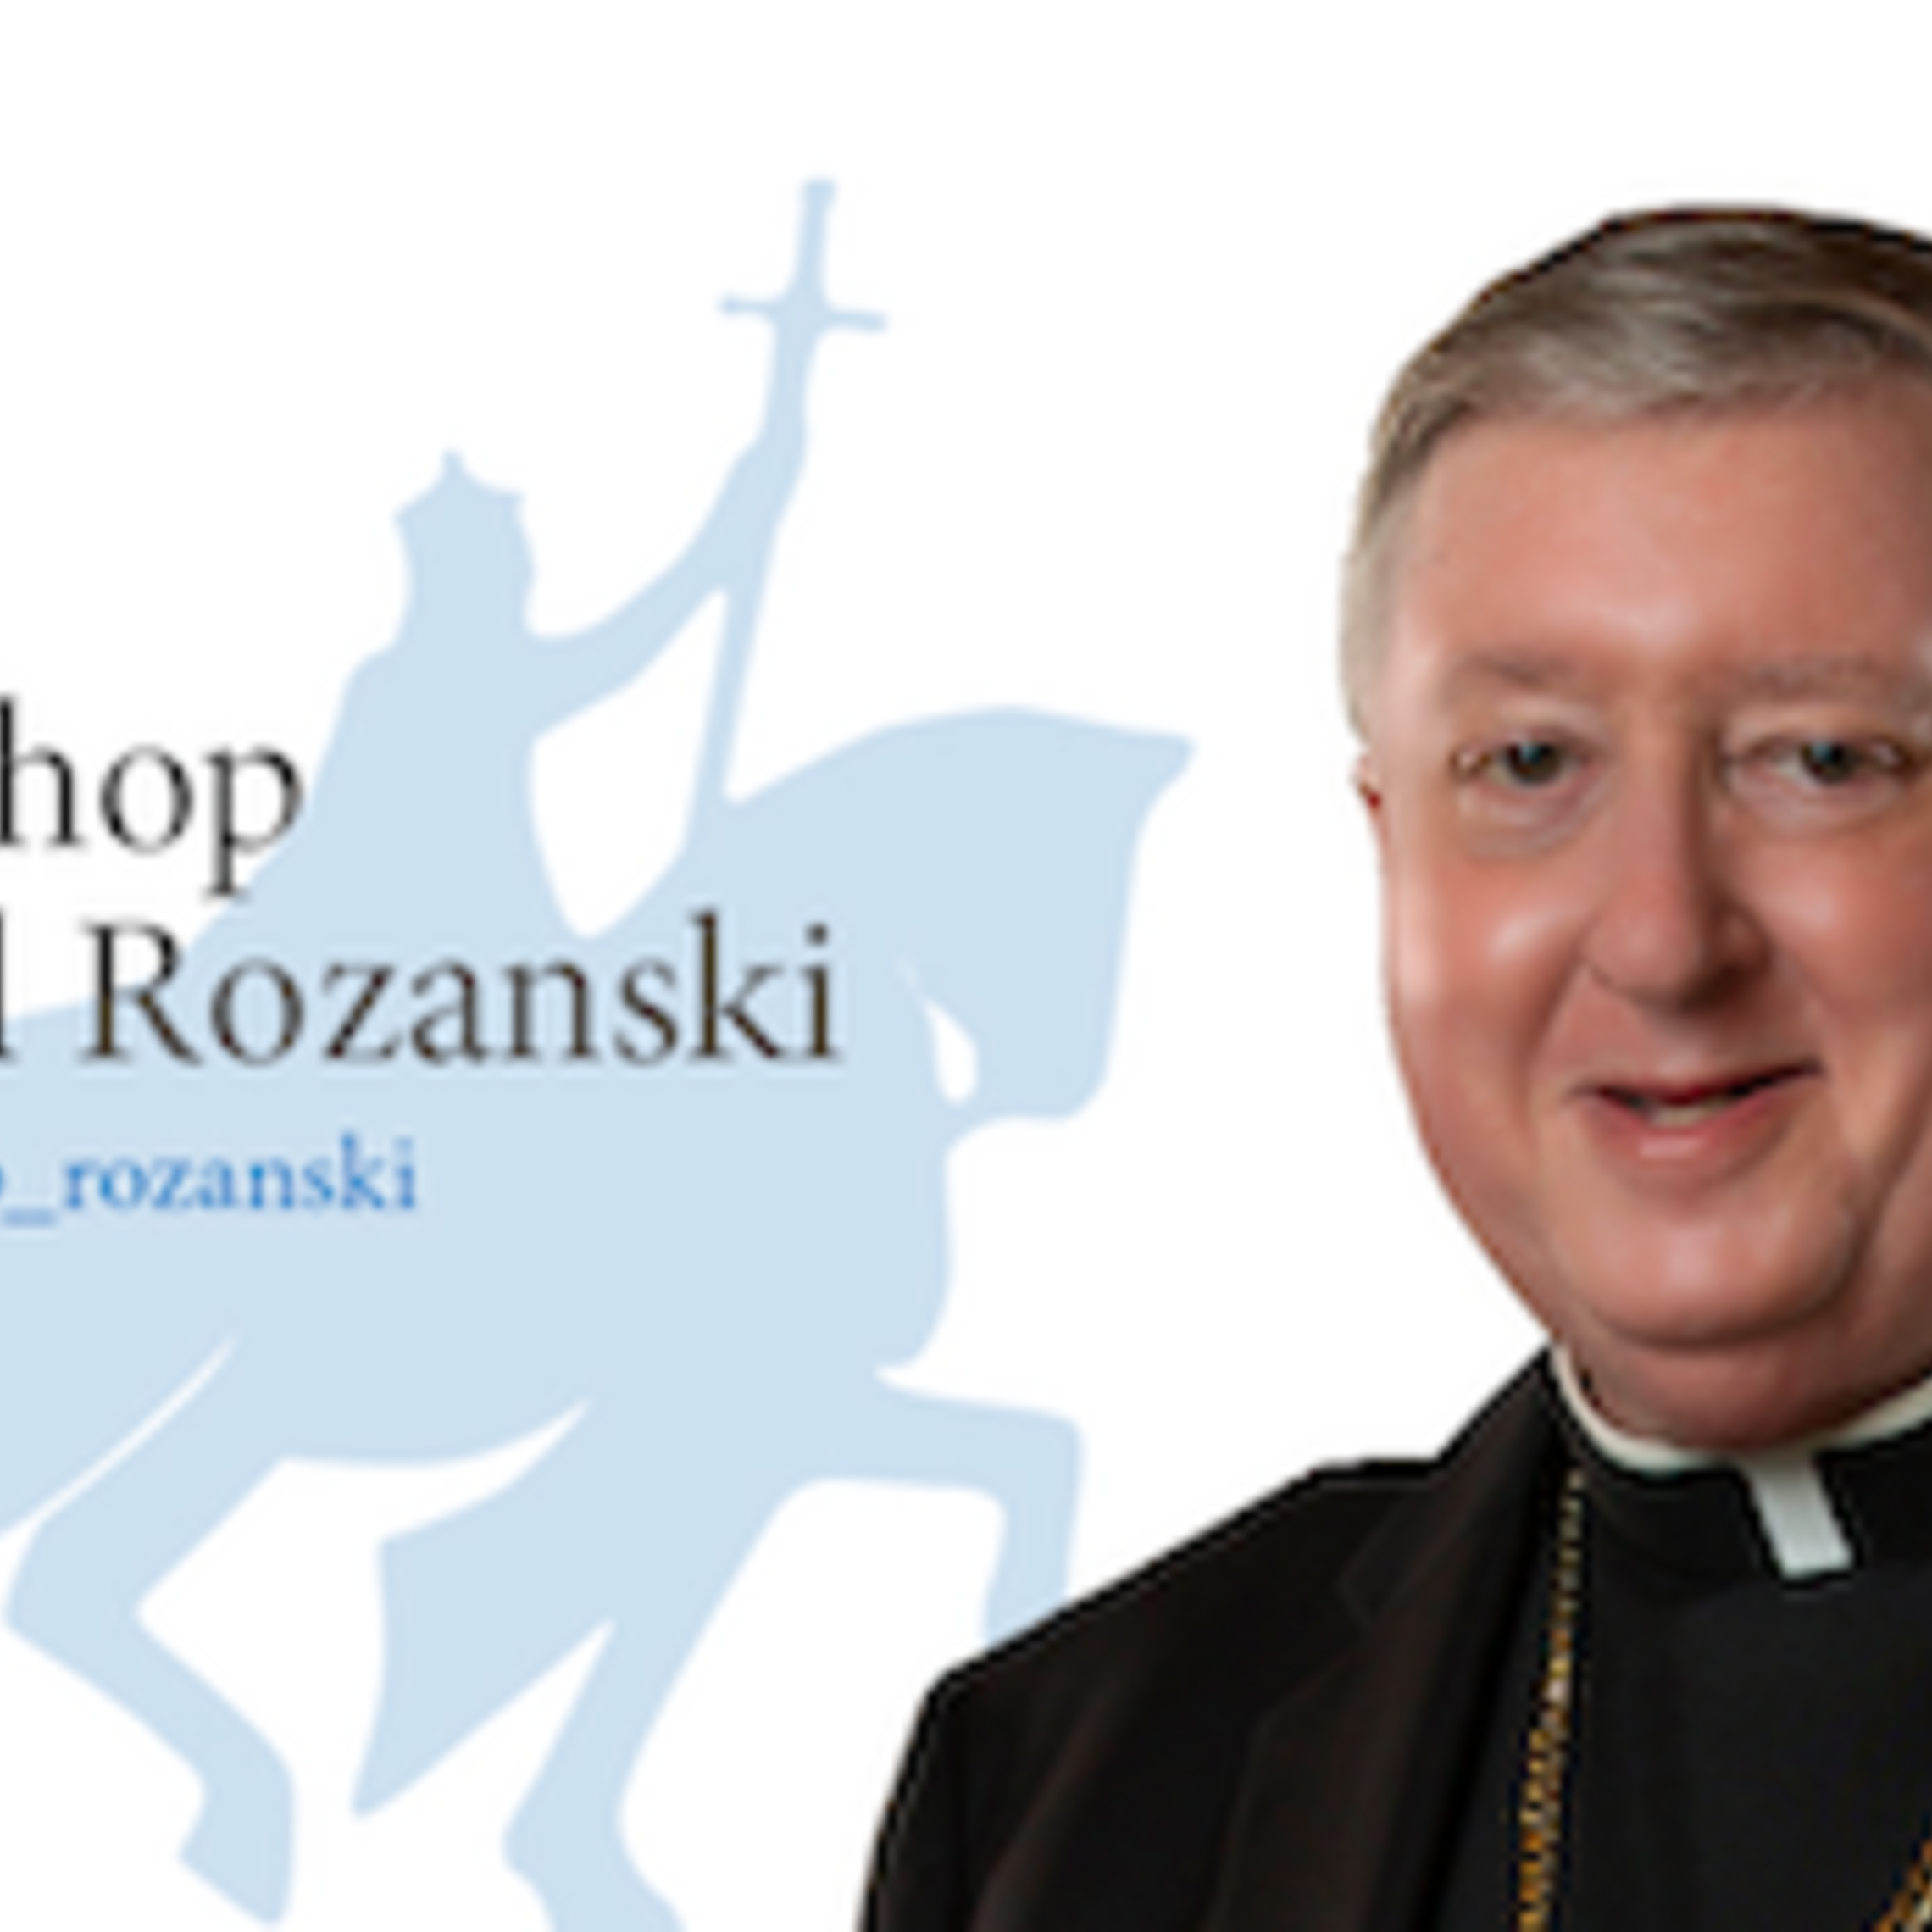 Abp Rozanski Twitter